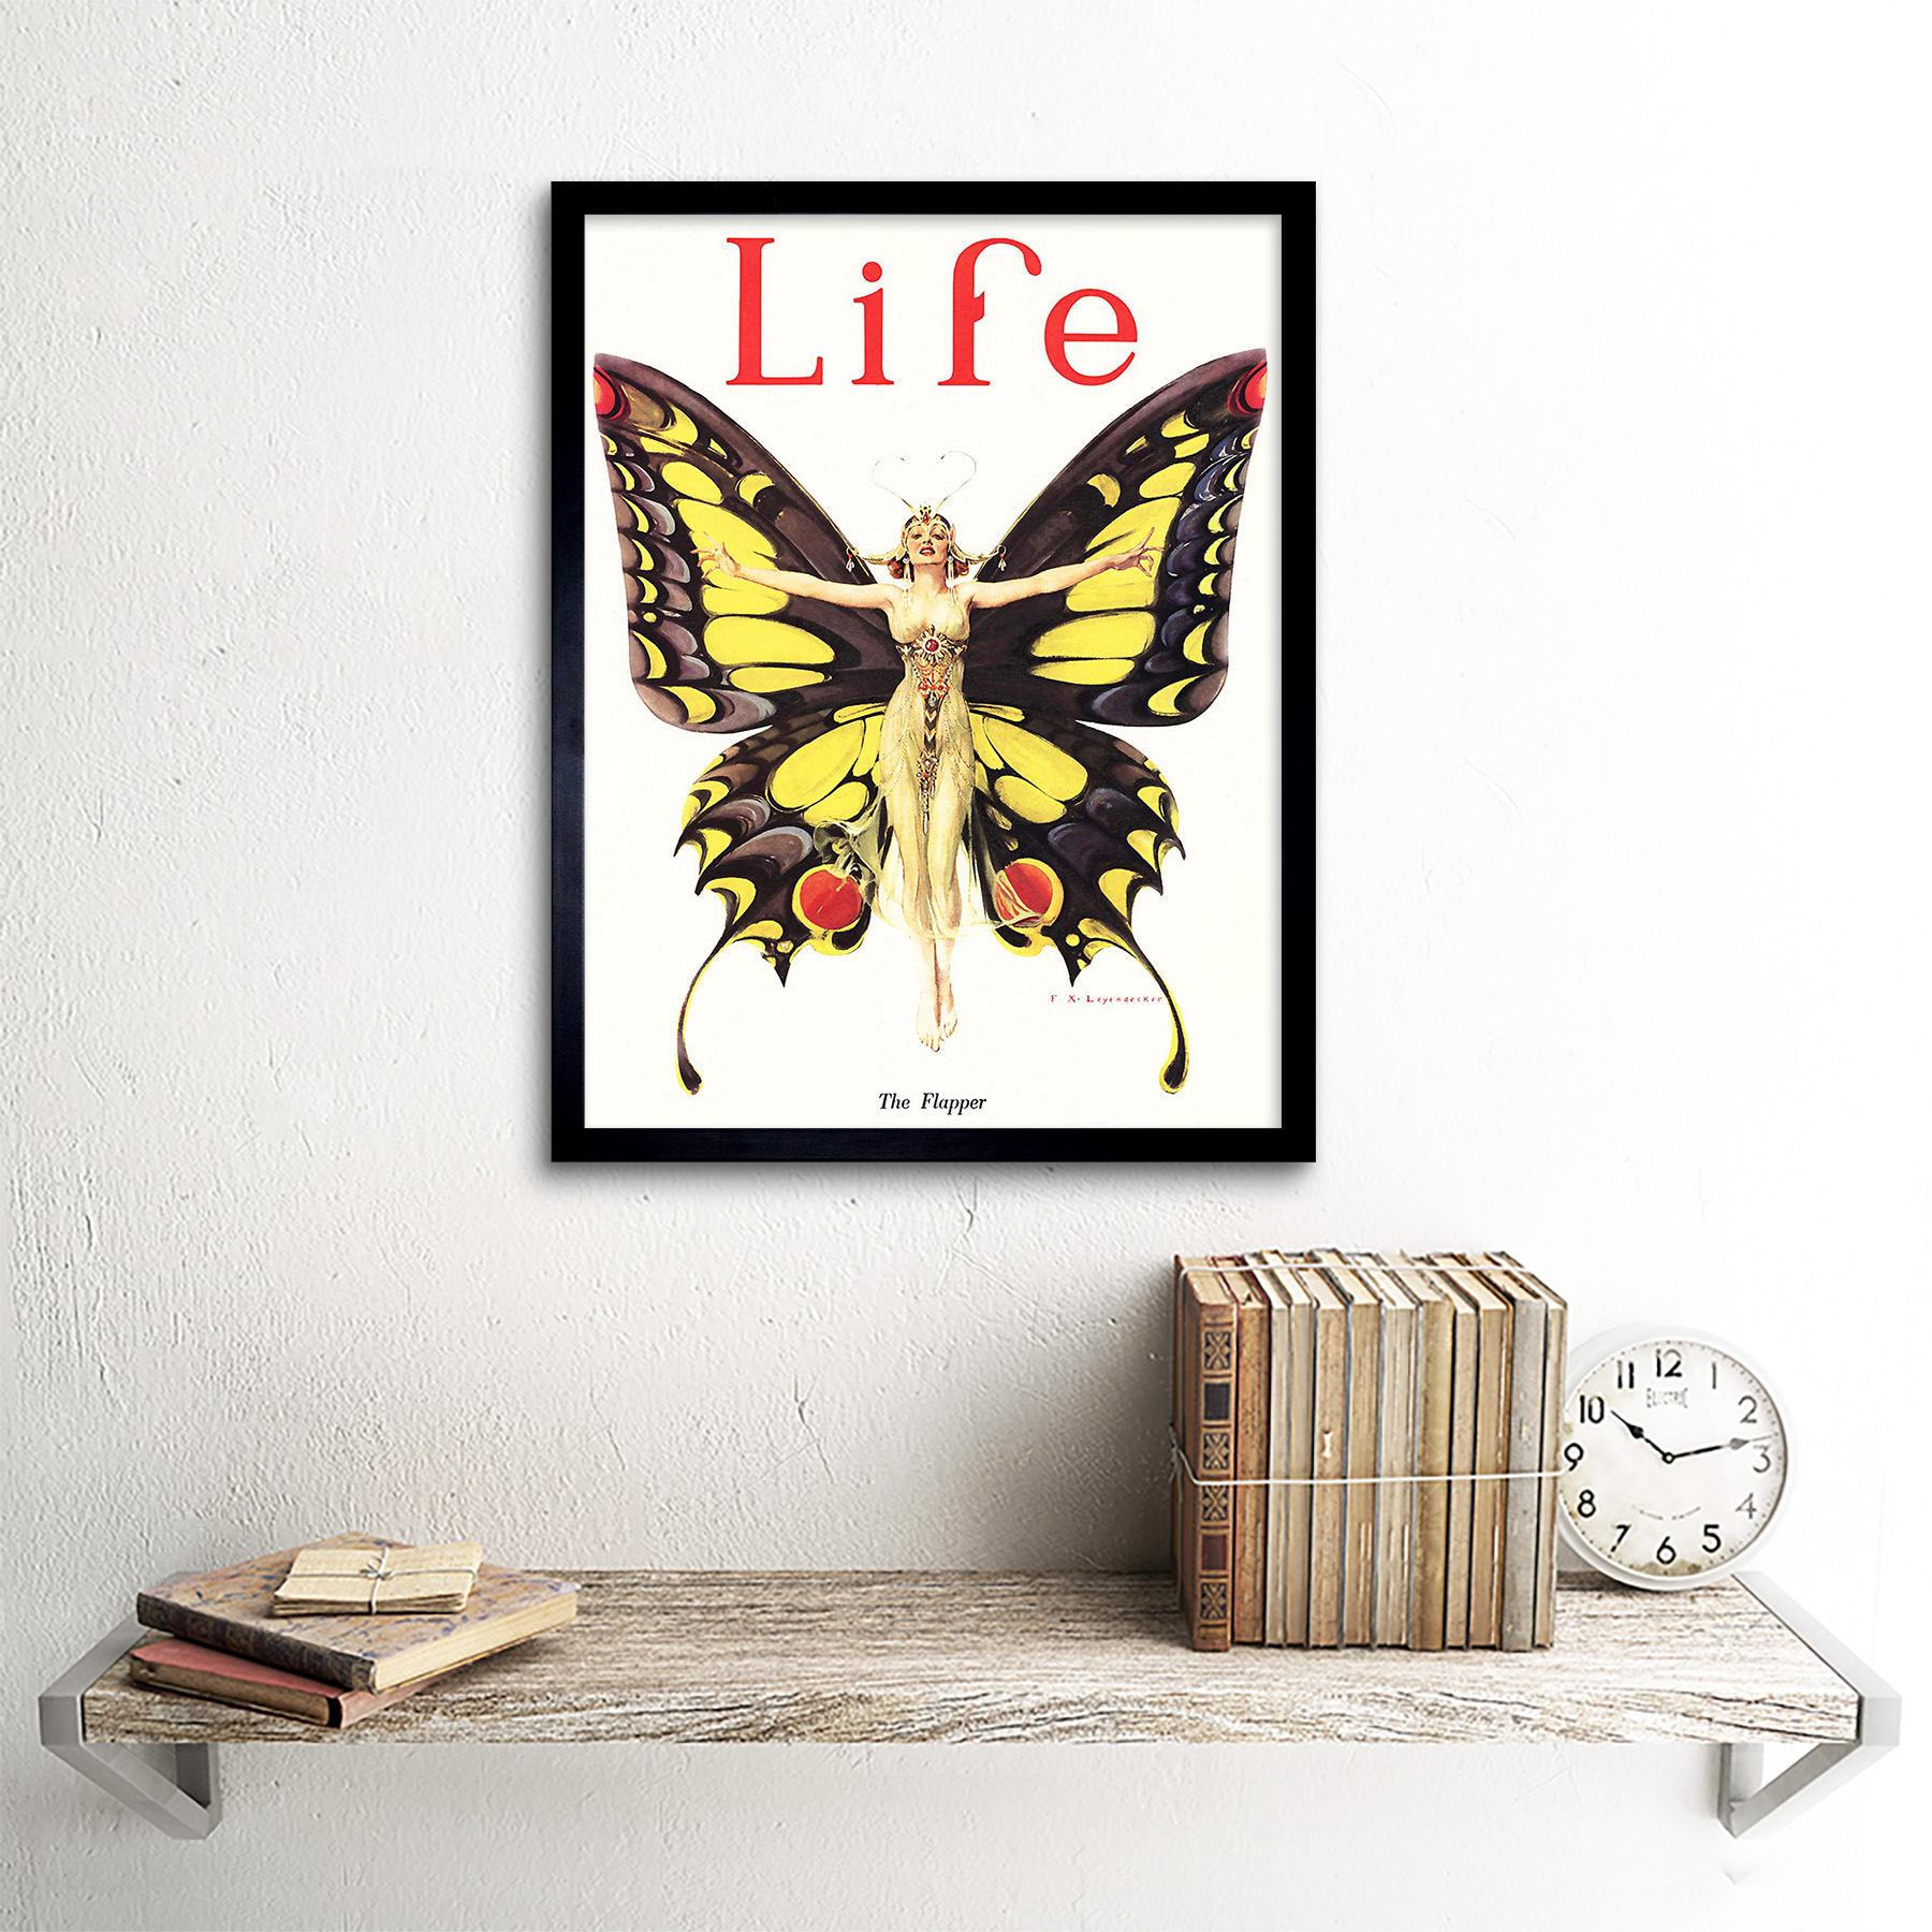 Magazine 1922 Life Butterfly Dancer 12X16 Inch Framed Art Print